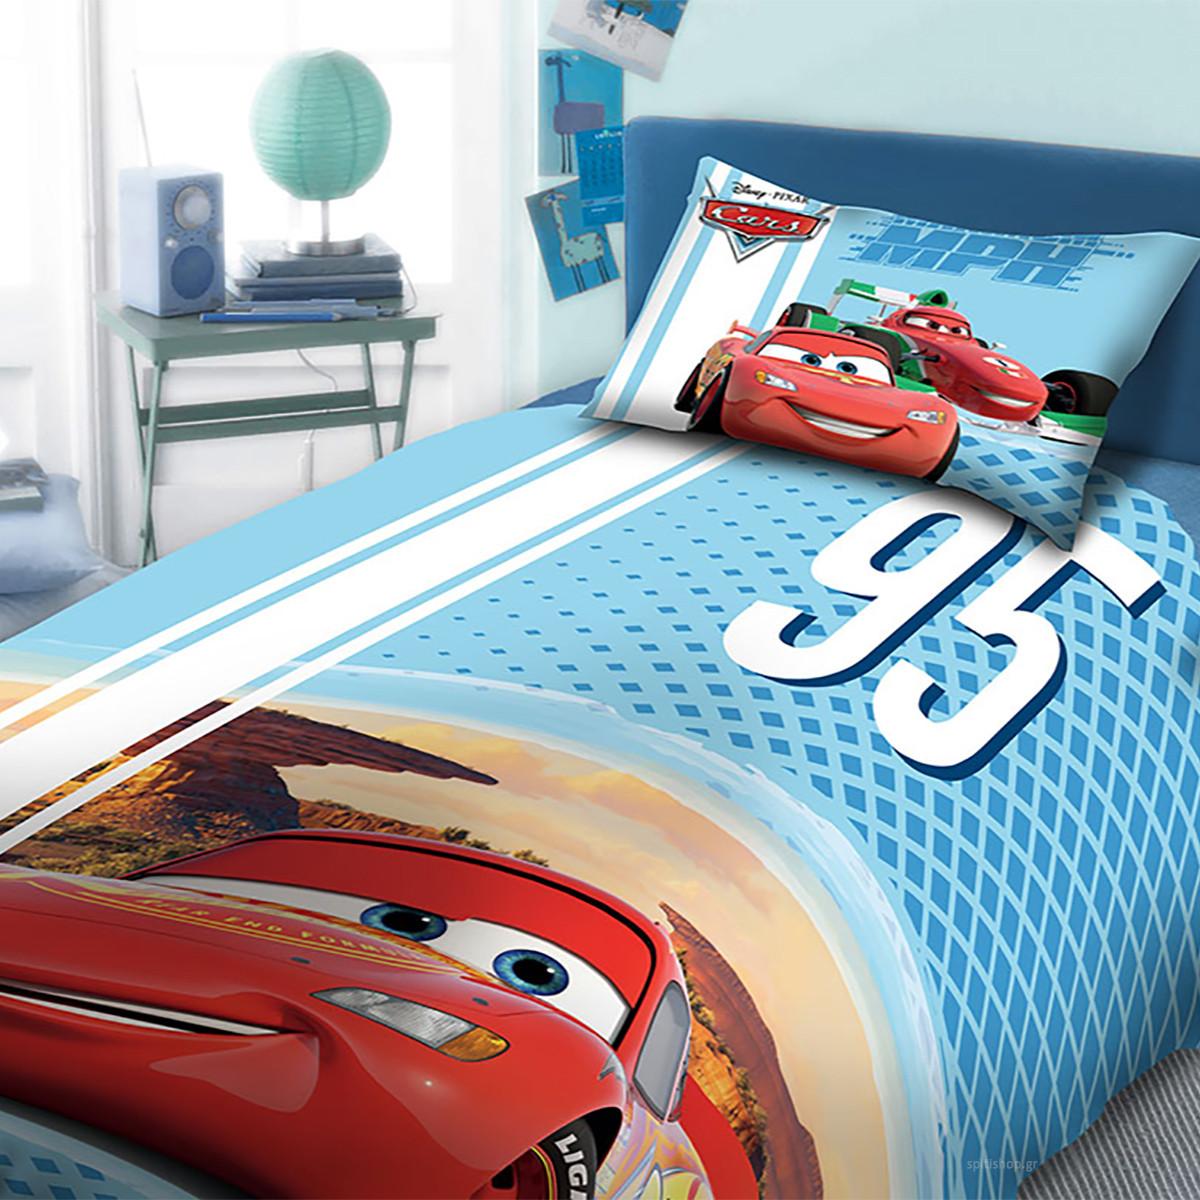 f4be765b394 -10% Spiti Shop Σεντόνια Μονά (Σετ 3τμχ) Dim Collection Cars 973